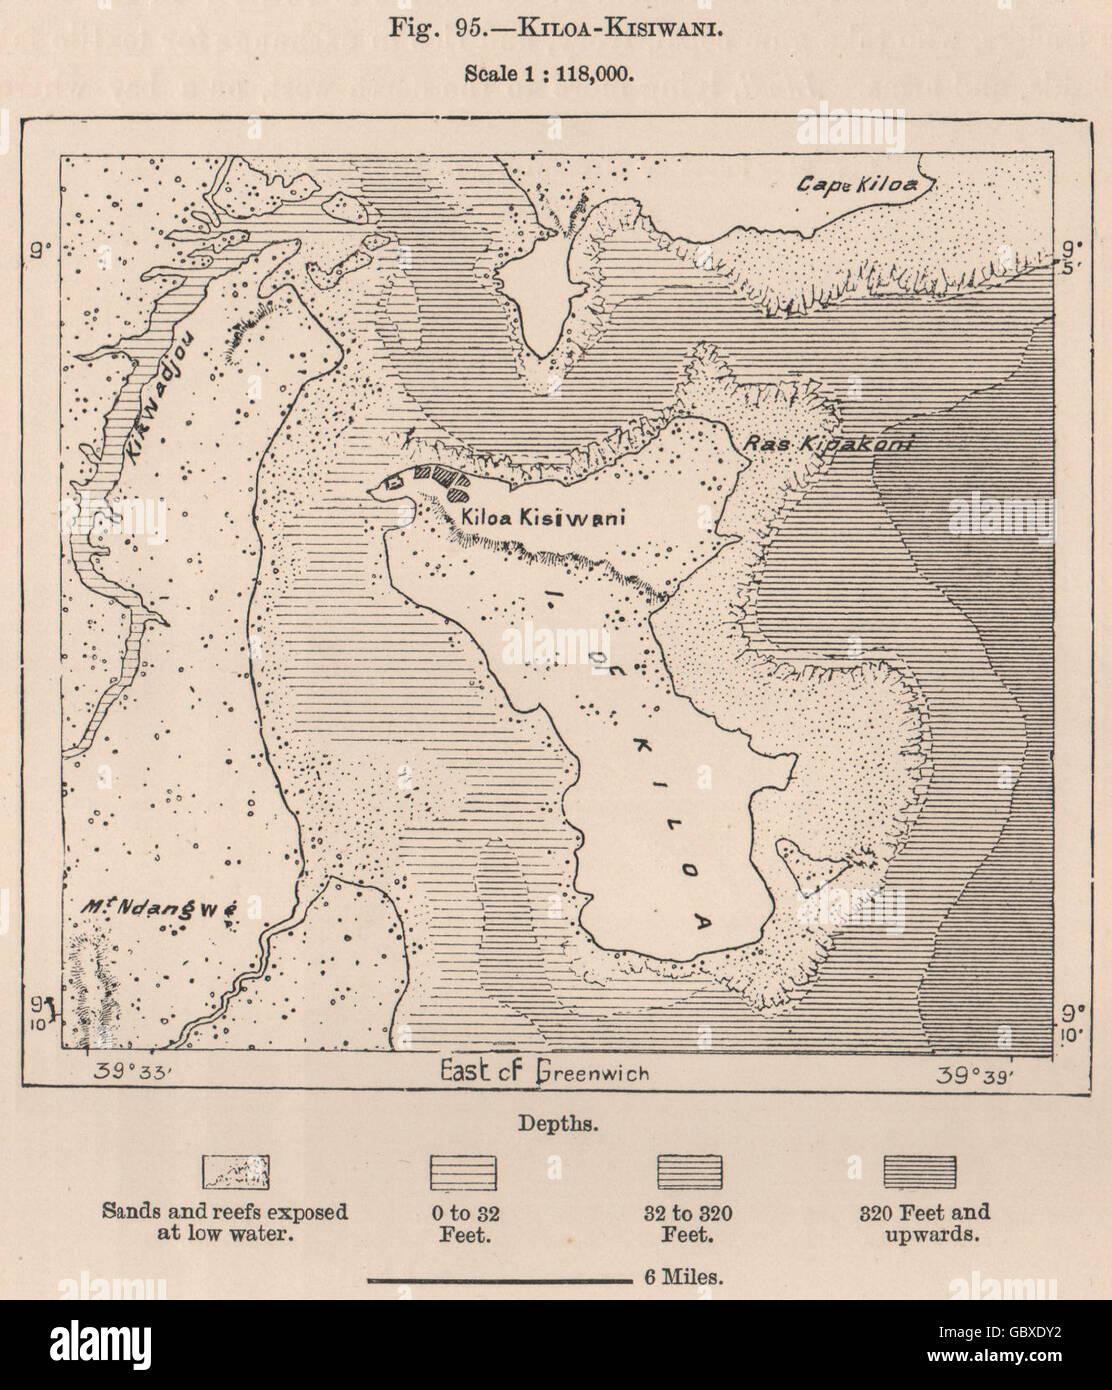 Kilwa Stock Photos & Kilwa Stock Images - Alamy on muslim world map, sahara world map, potosi world map, sofala world map, heian world map, ancient kilwa map, novgorod world map, ancient african kingdom map, varanasi world map, mogadishu world map, gujarat world map, surat world map, plain world map, isfahan world map, kilwa on a map, the meroe kush africa on map, tian shan world map,